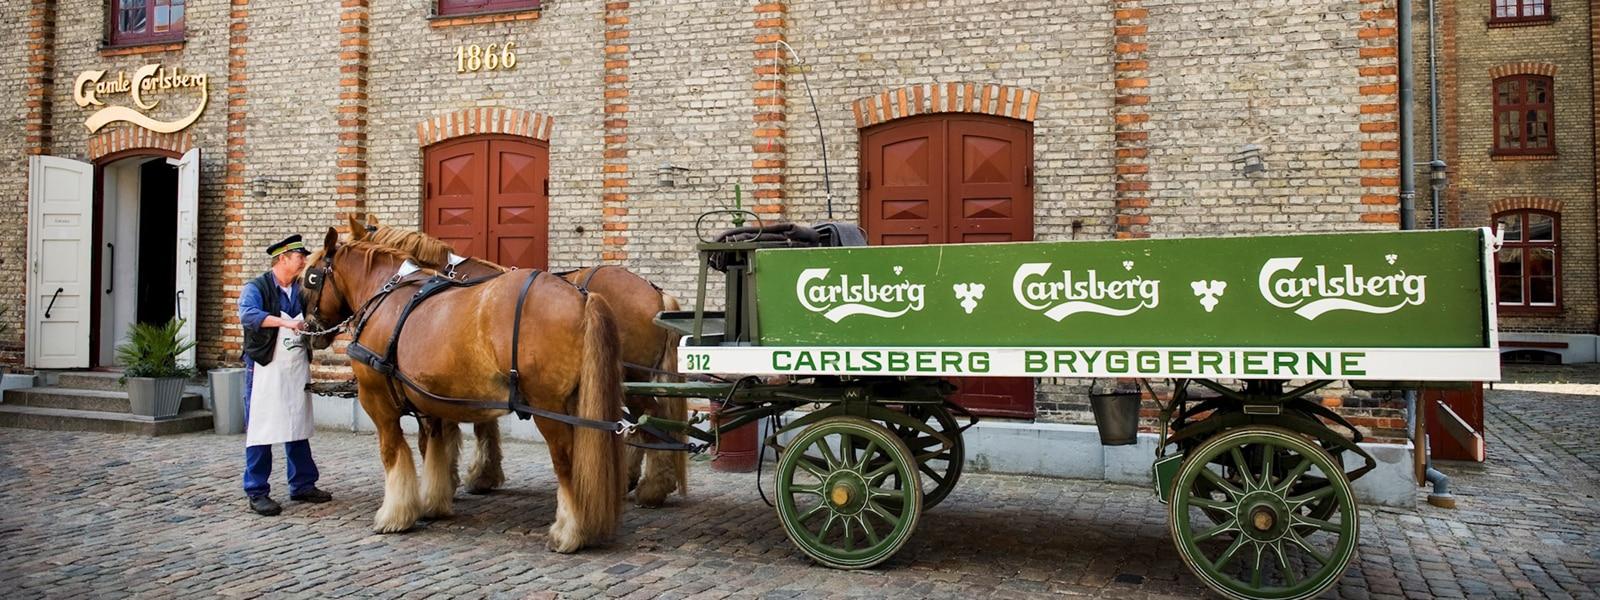 Carlsberg products